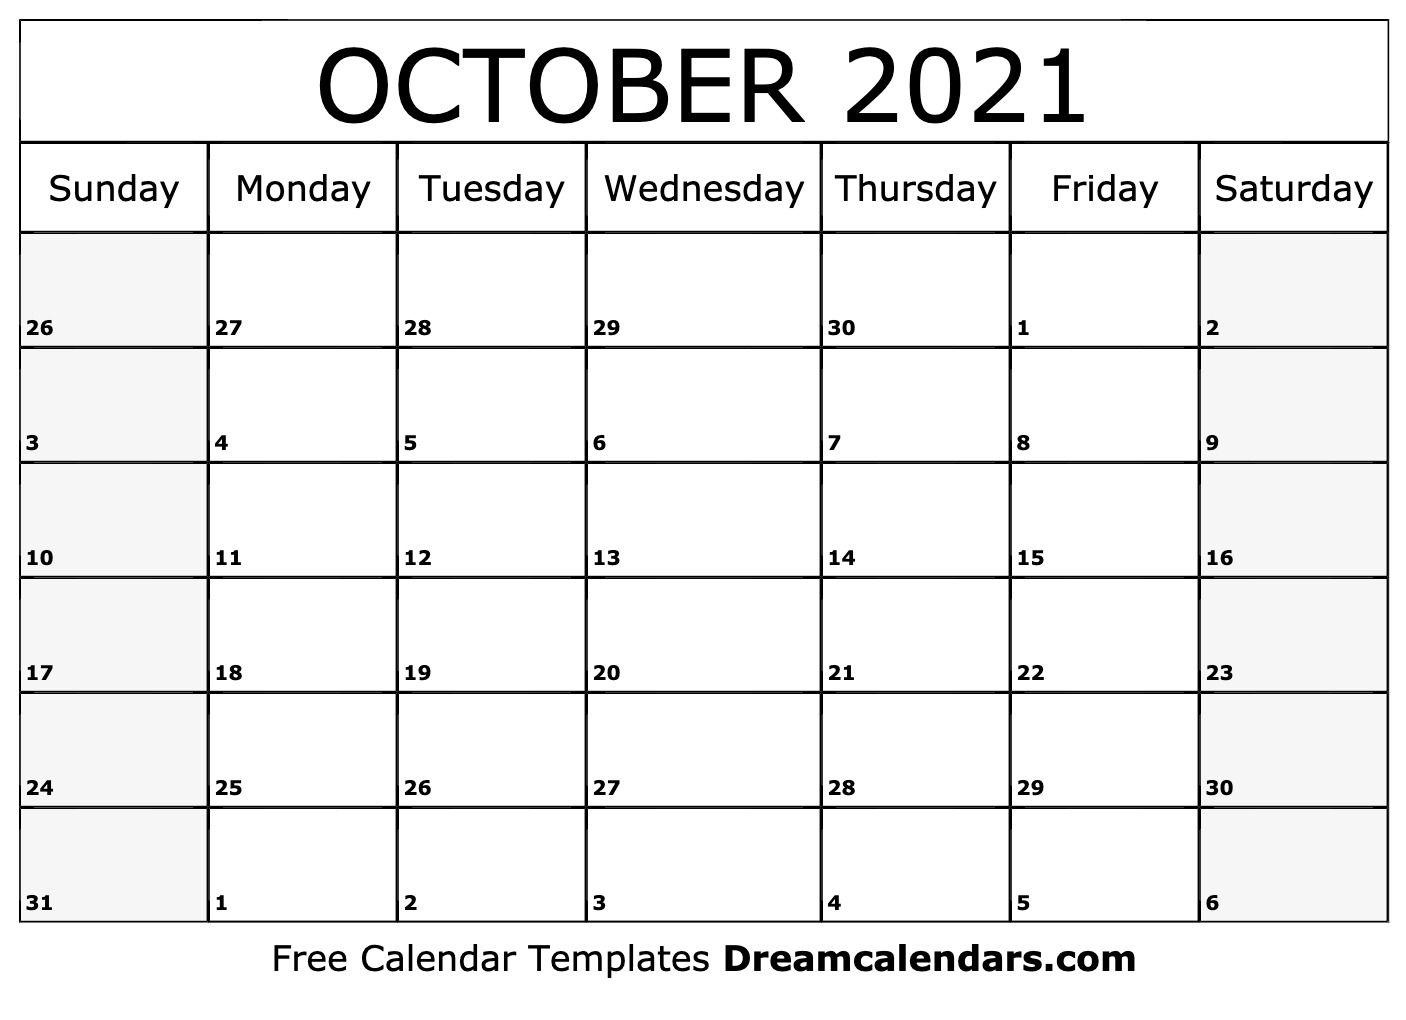 October 2021 Calendar   Free Blank Printable Templates